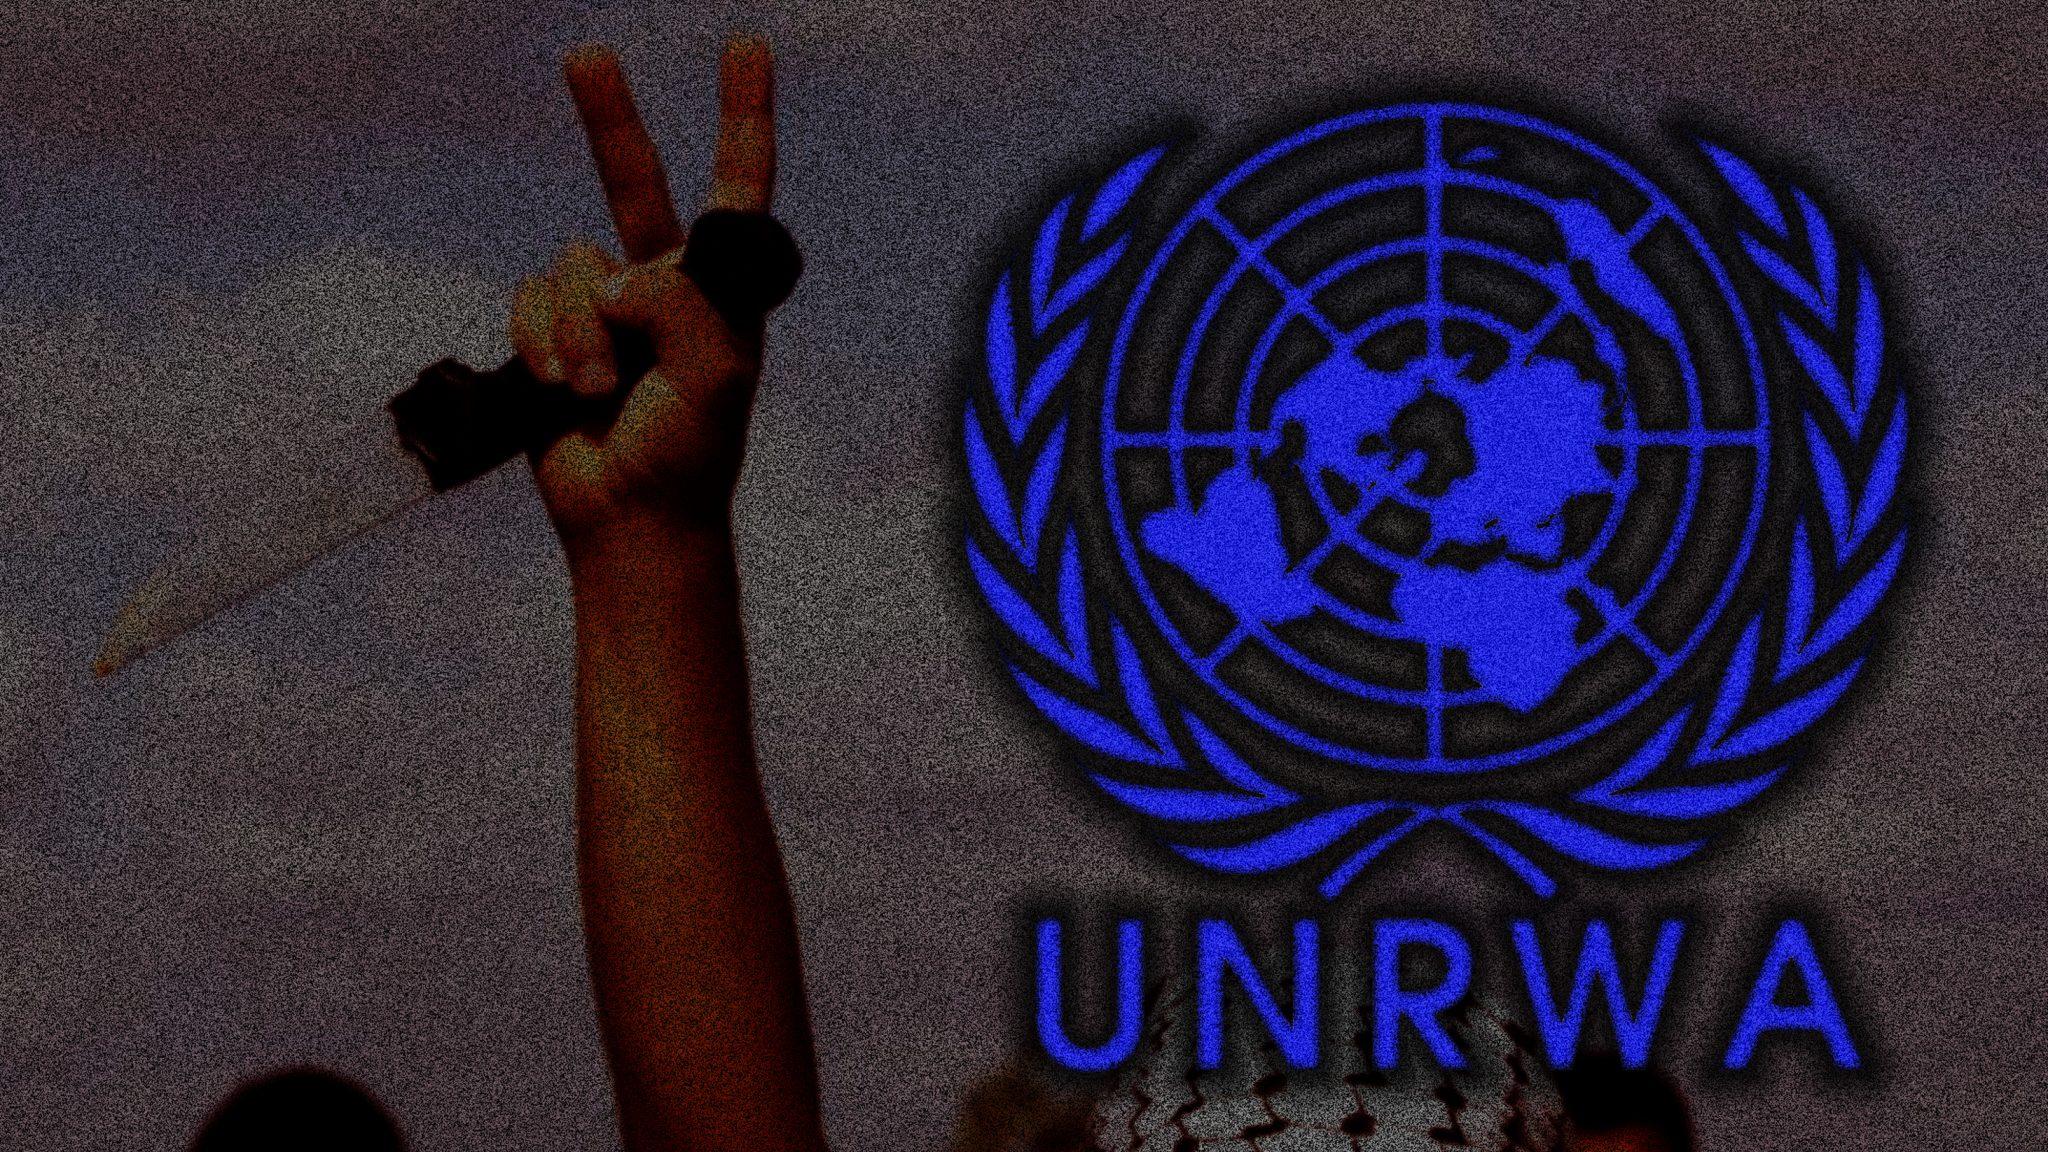 NZ must reconsider unconditional support of UNRWA